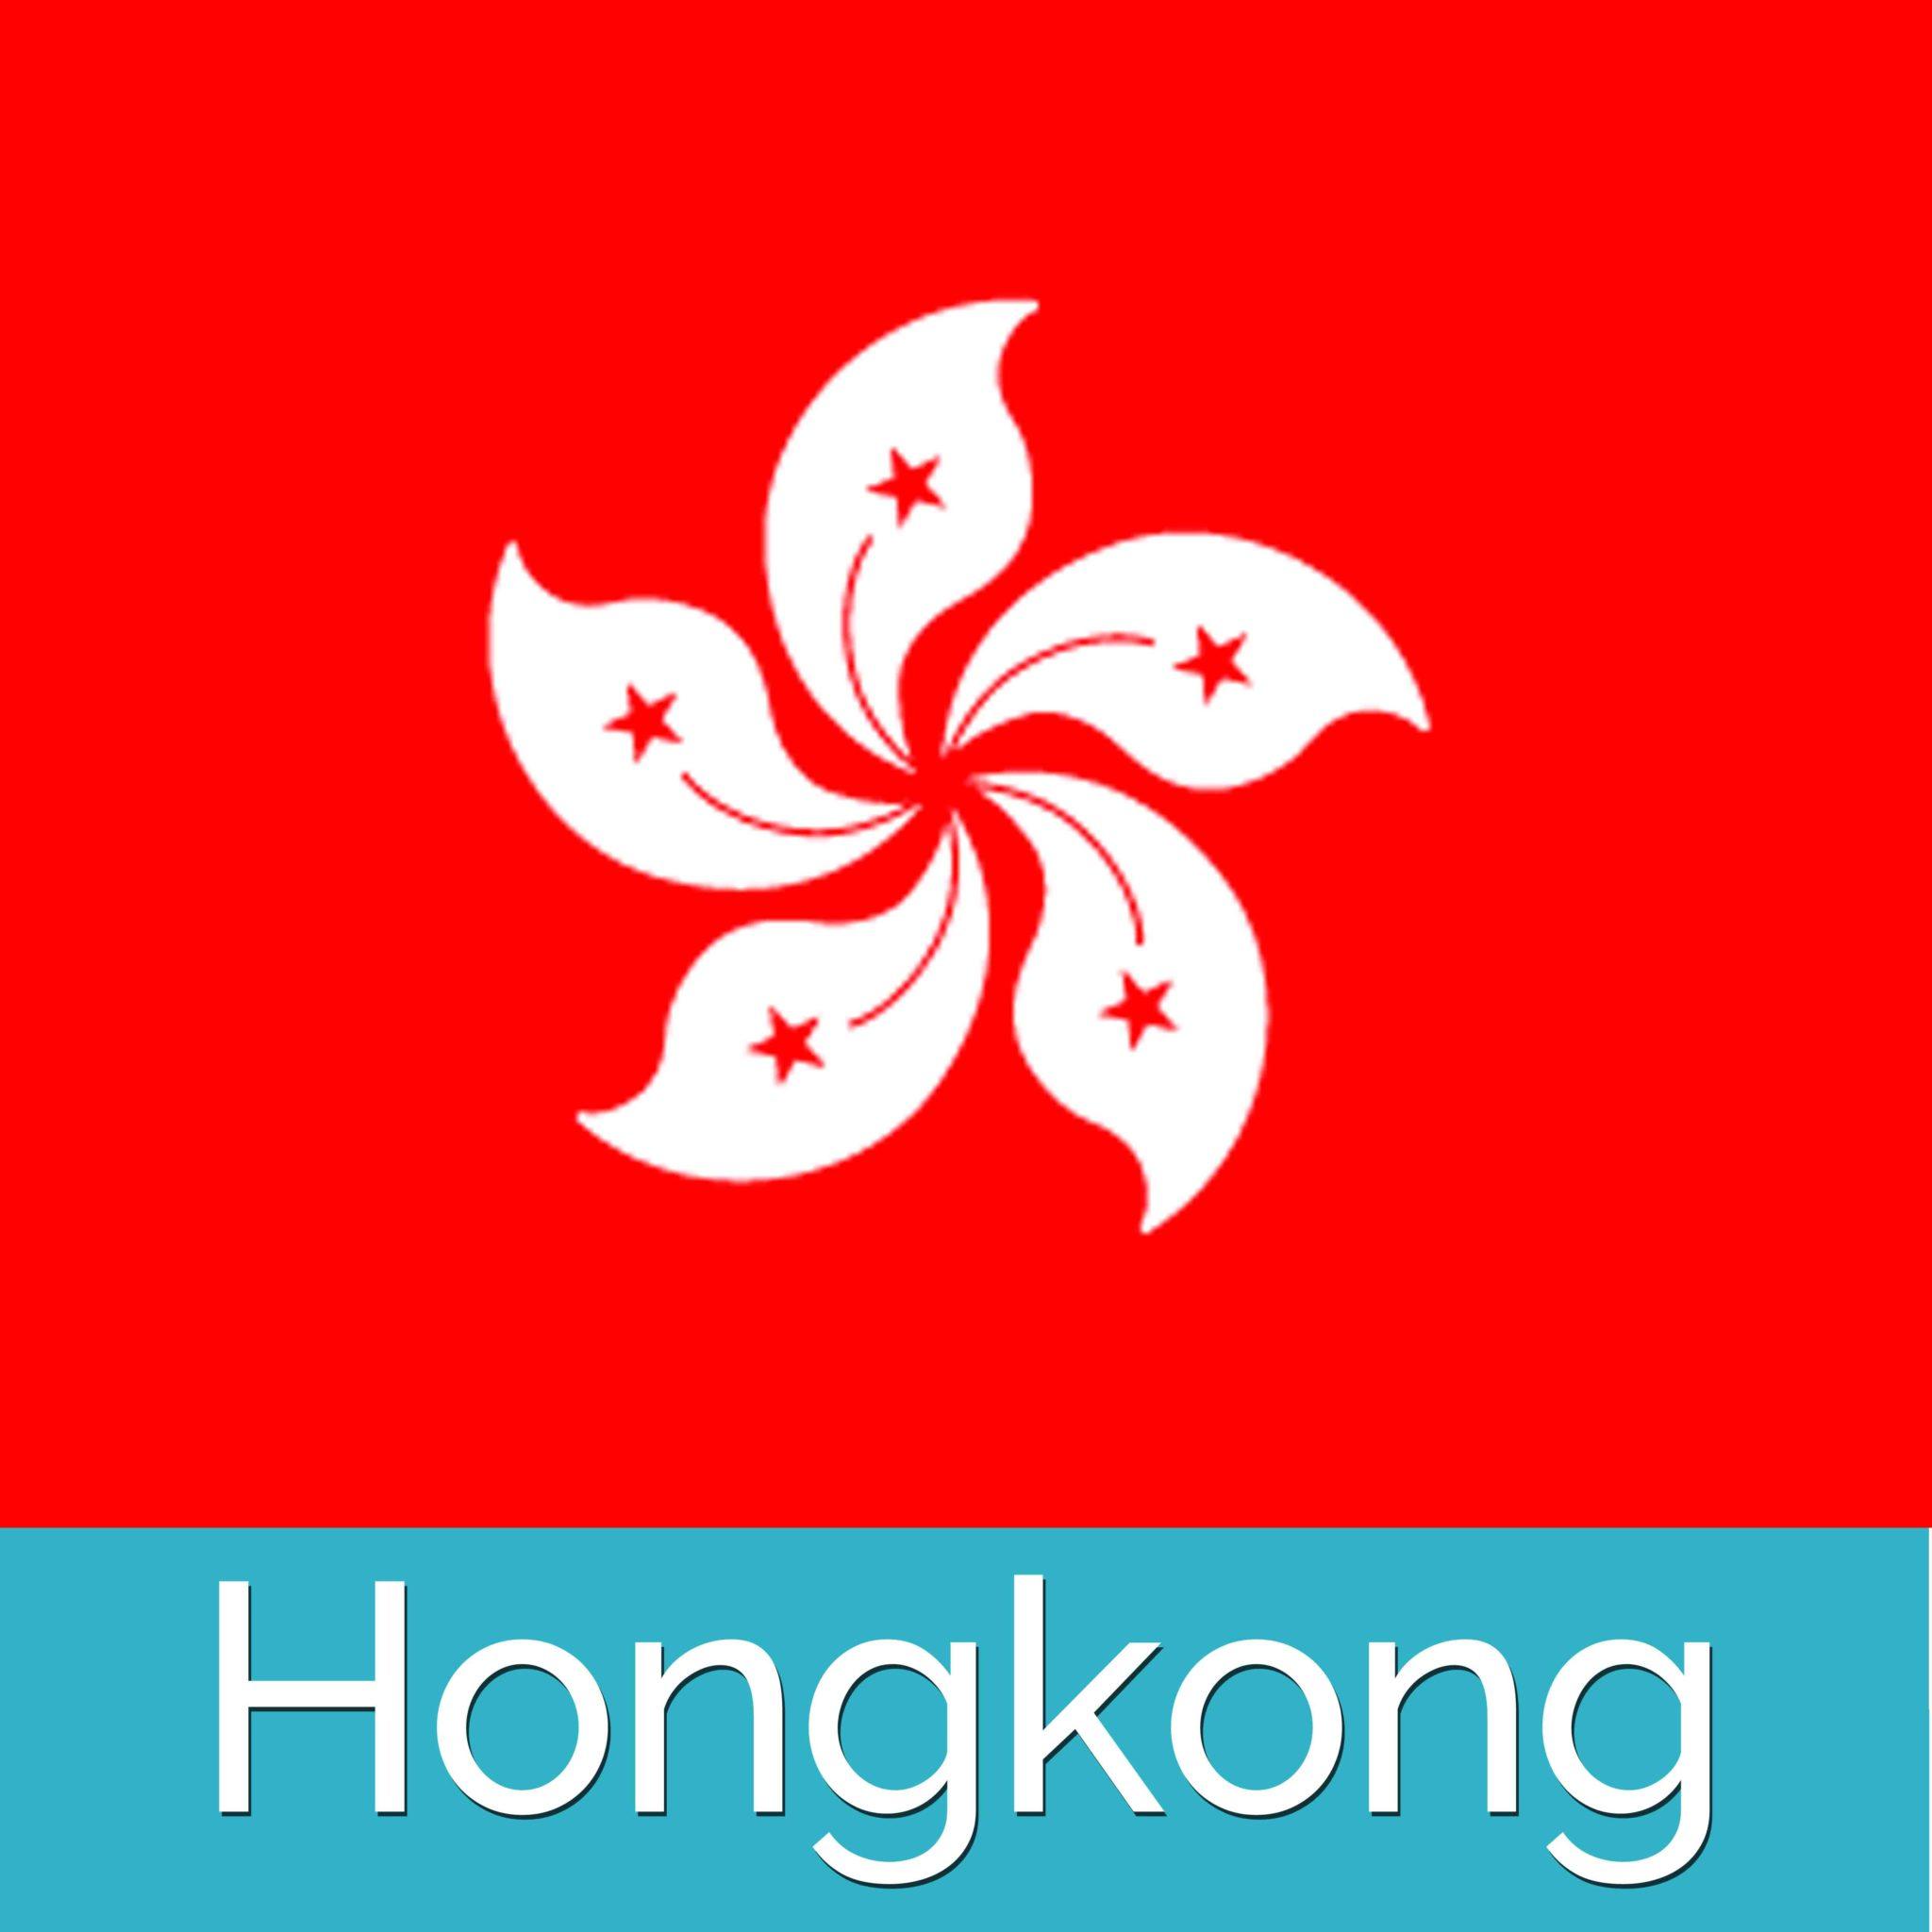 Hongkong Travel Guide